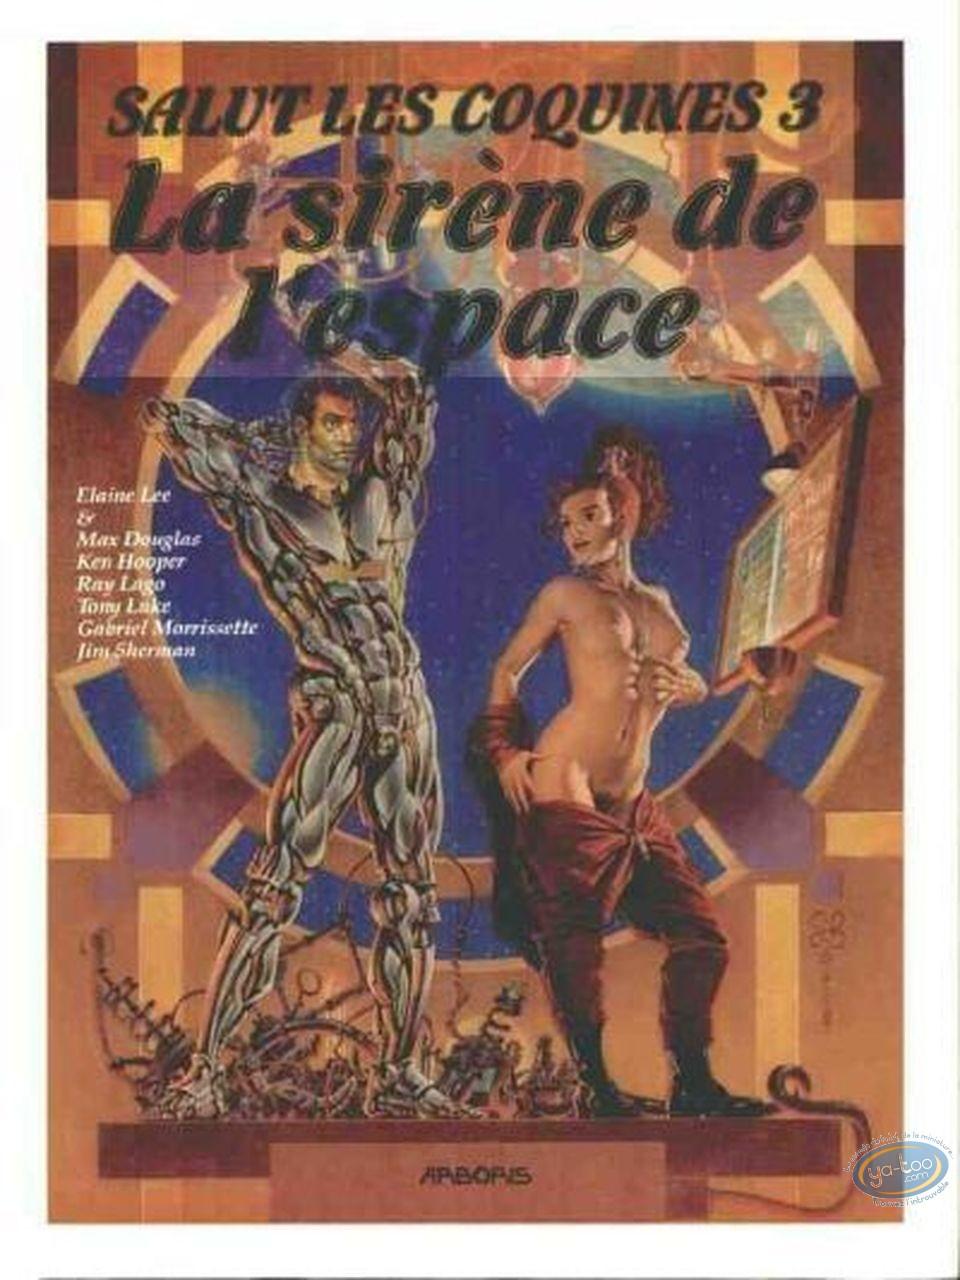 Adult European Comic Books, Salut les coquines : La sirène de l'espace - Salut les coquines